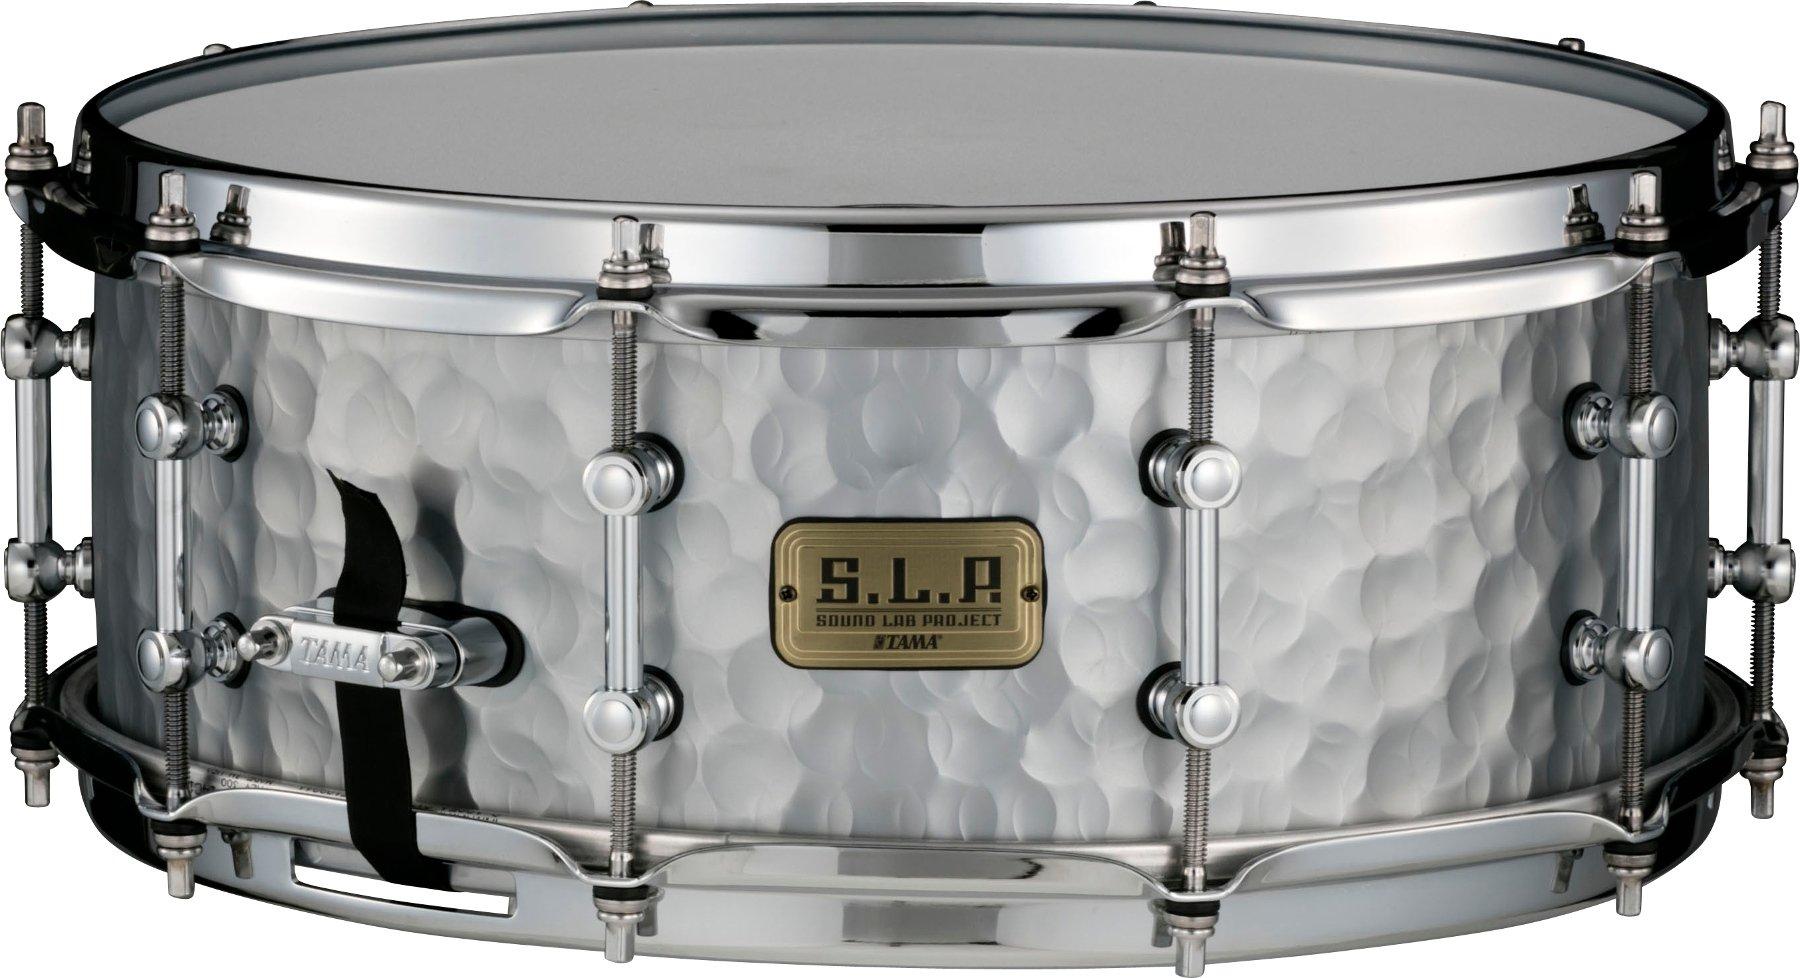 "Vintage Hammered Steel Snare Drum, 5.5""x14"""